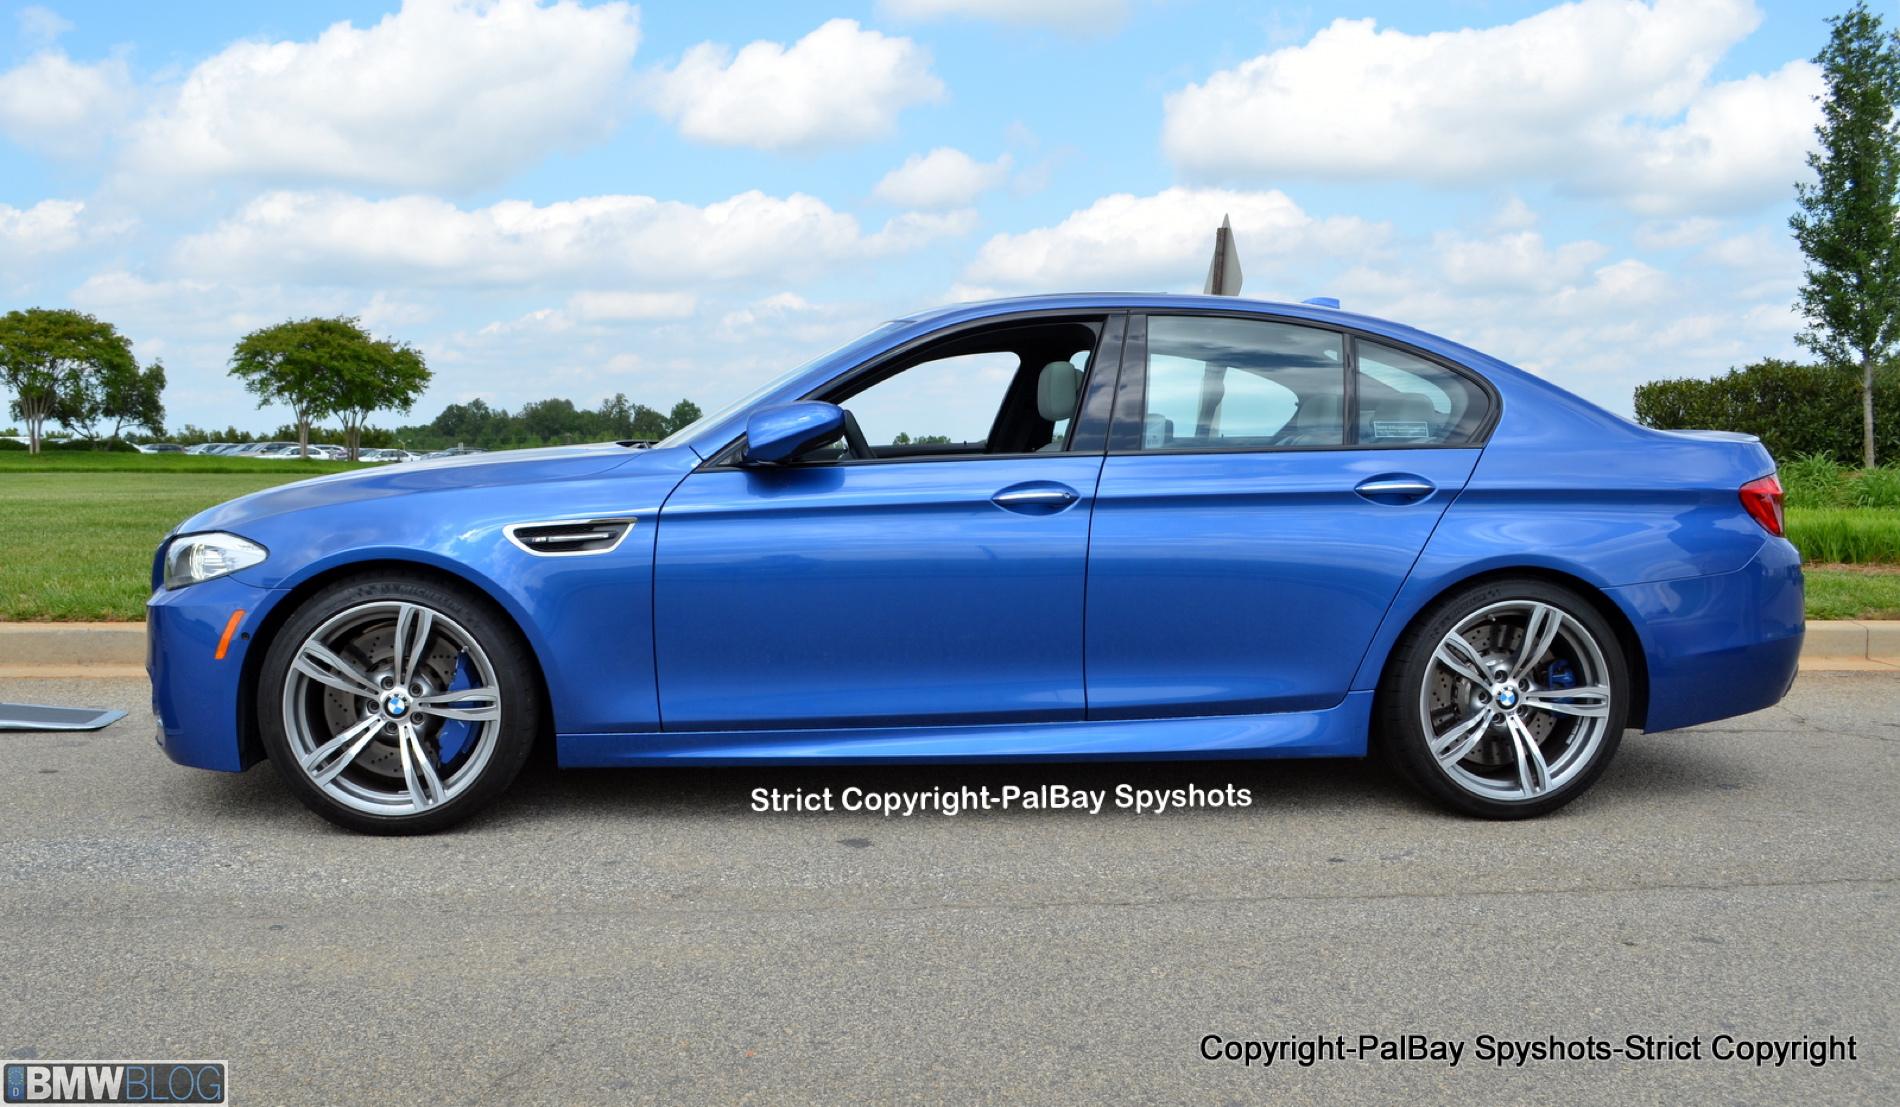 2013 BMW M5 - Image #13